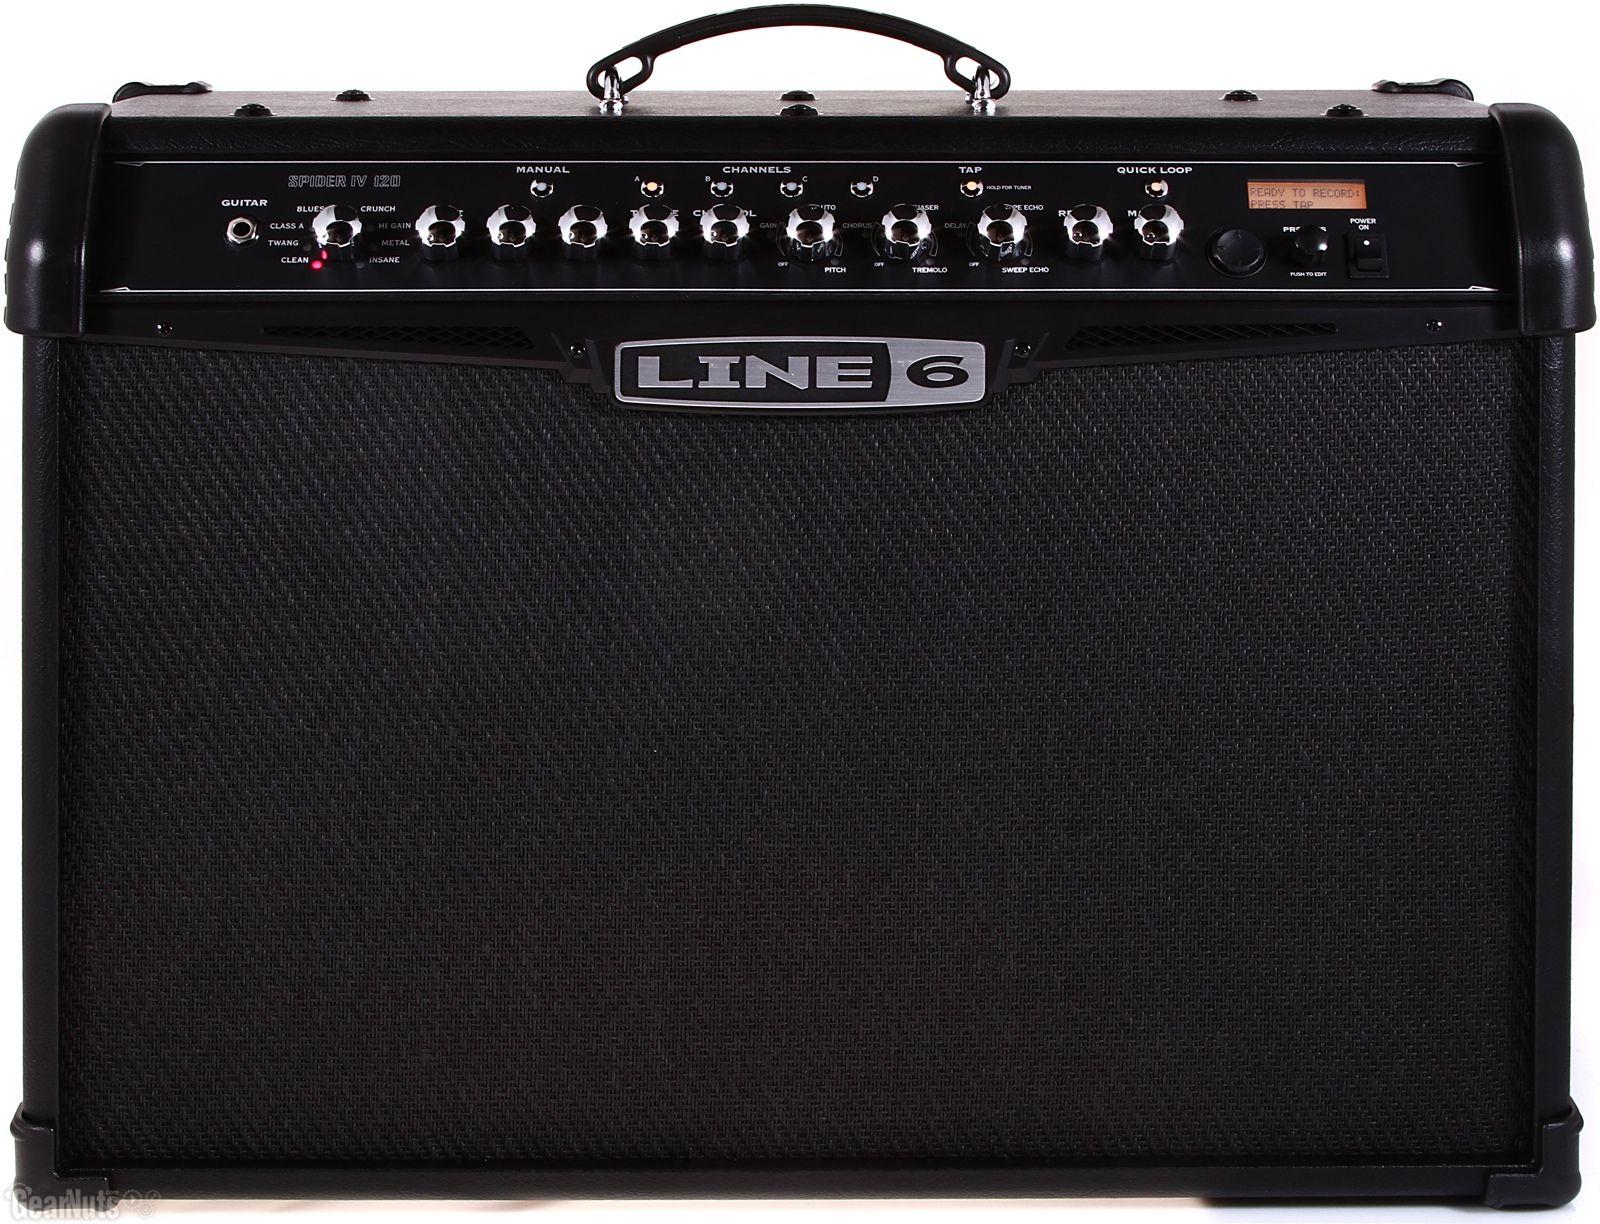 Line 6 Spider Iv 120 Combo Amplifier Bathroom Scale Amp